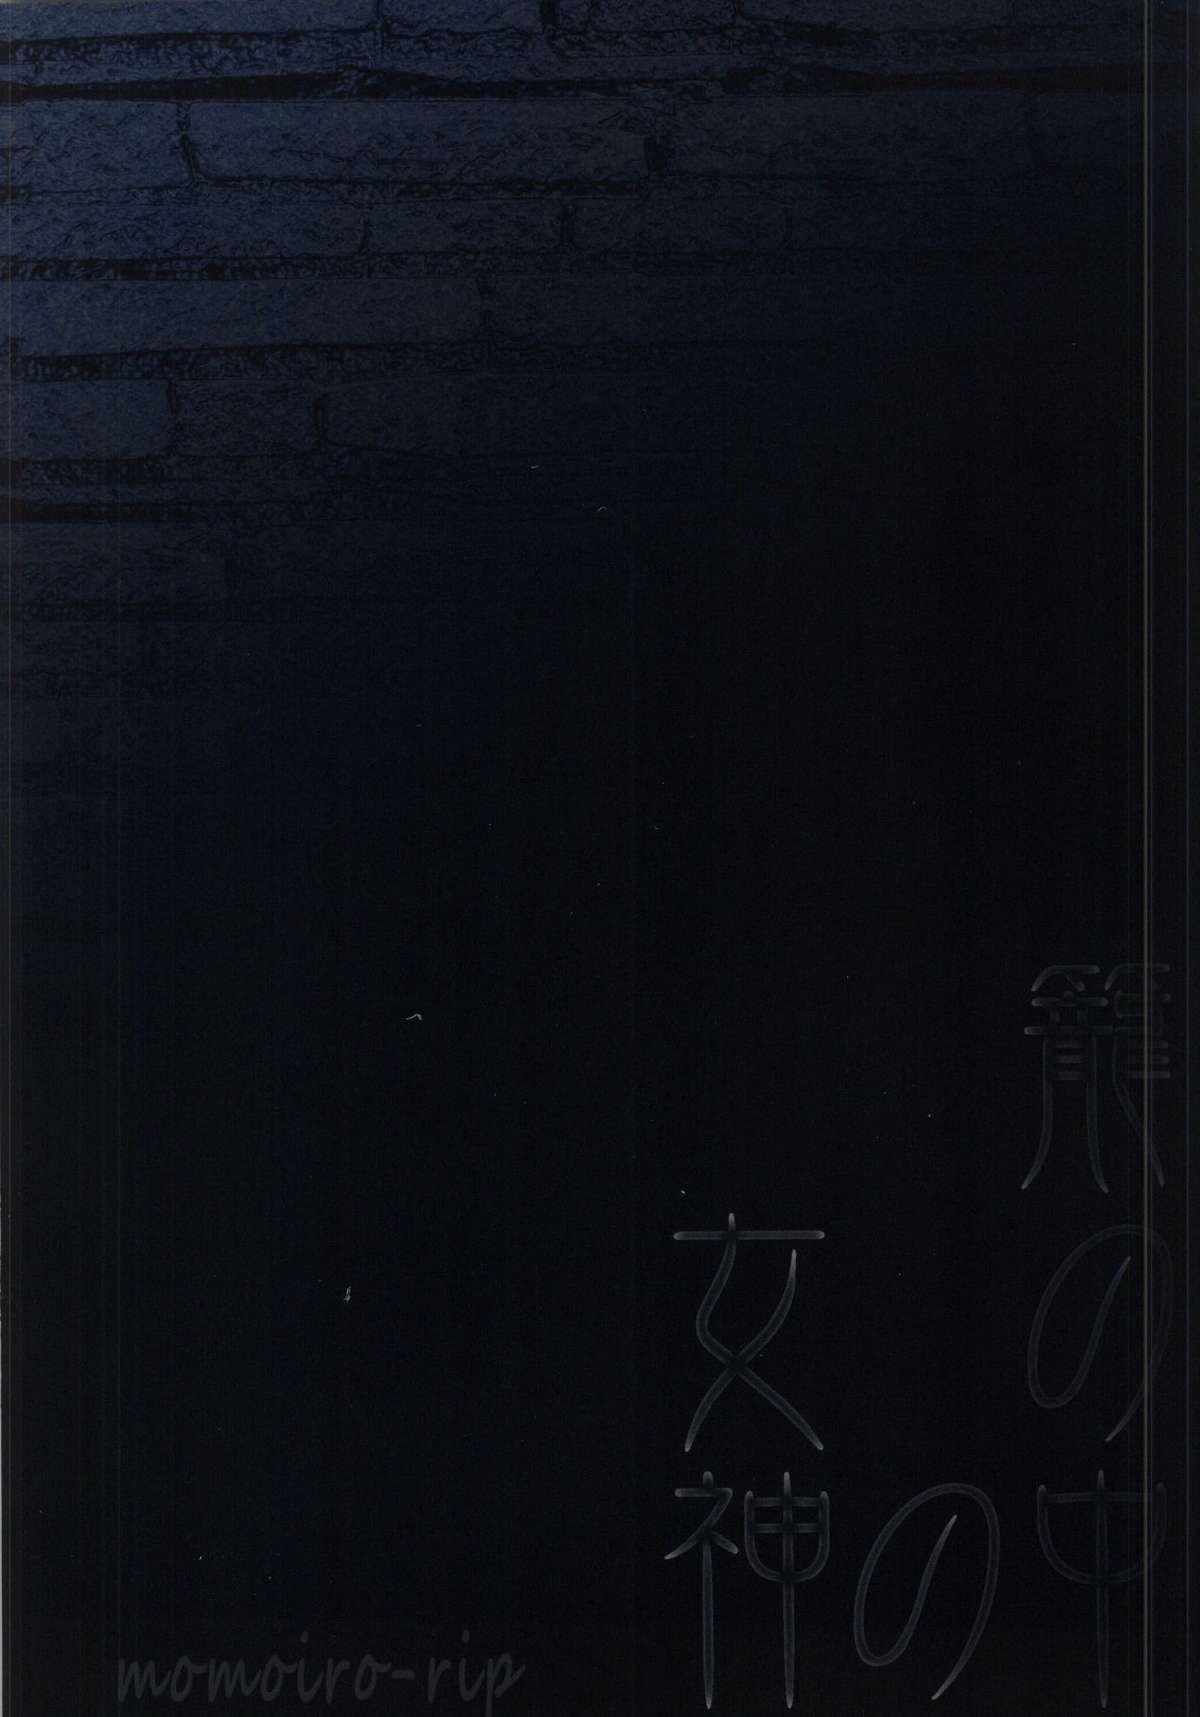 Kago no Naka no Megami 25